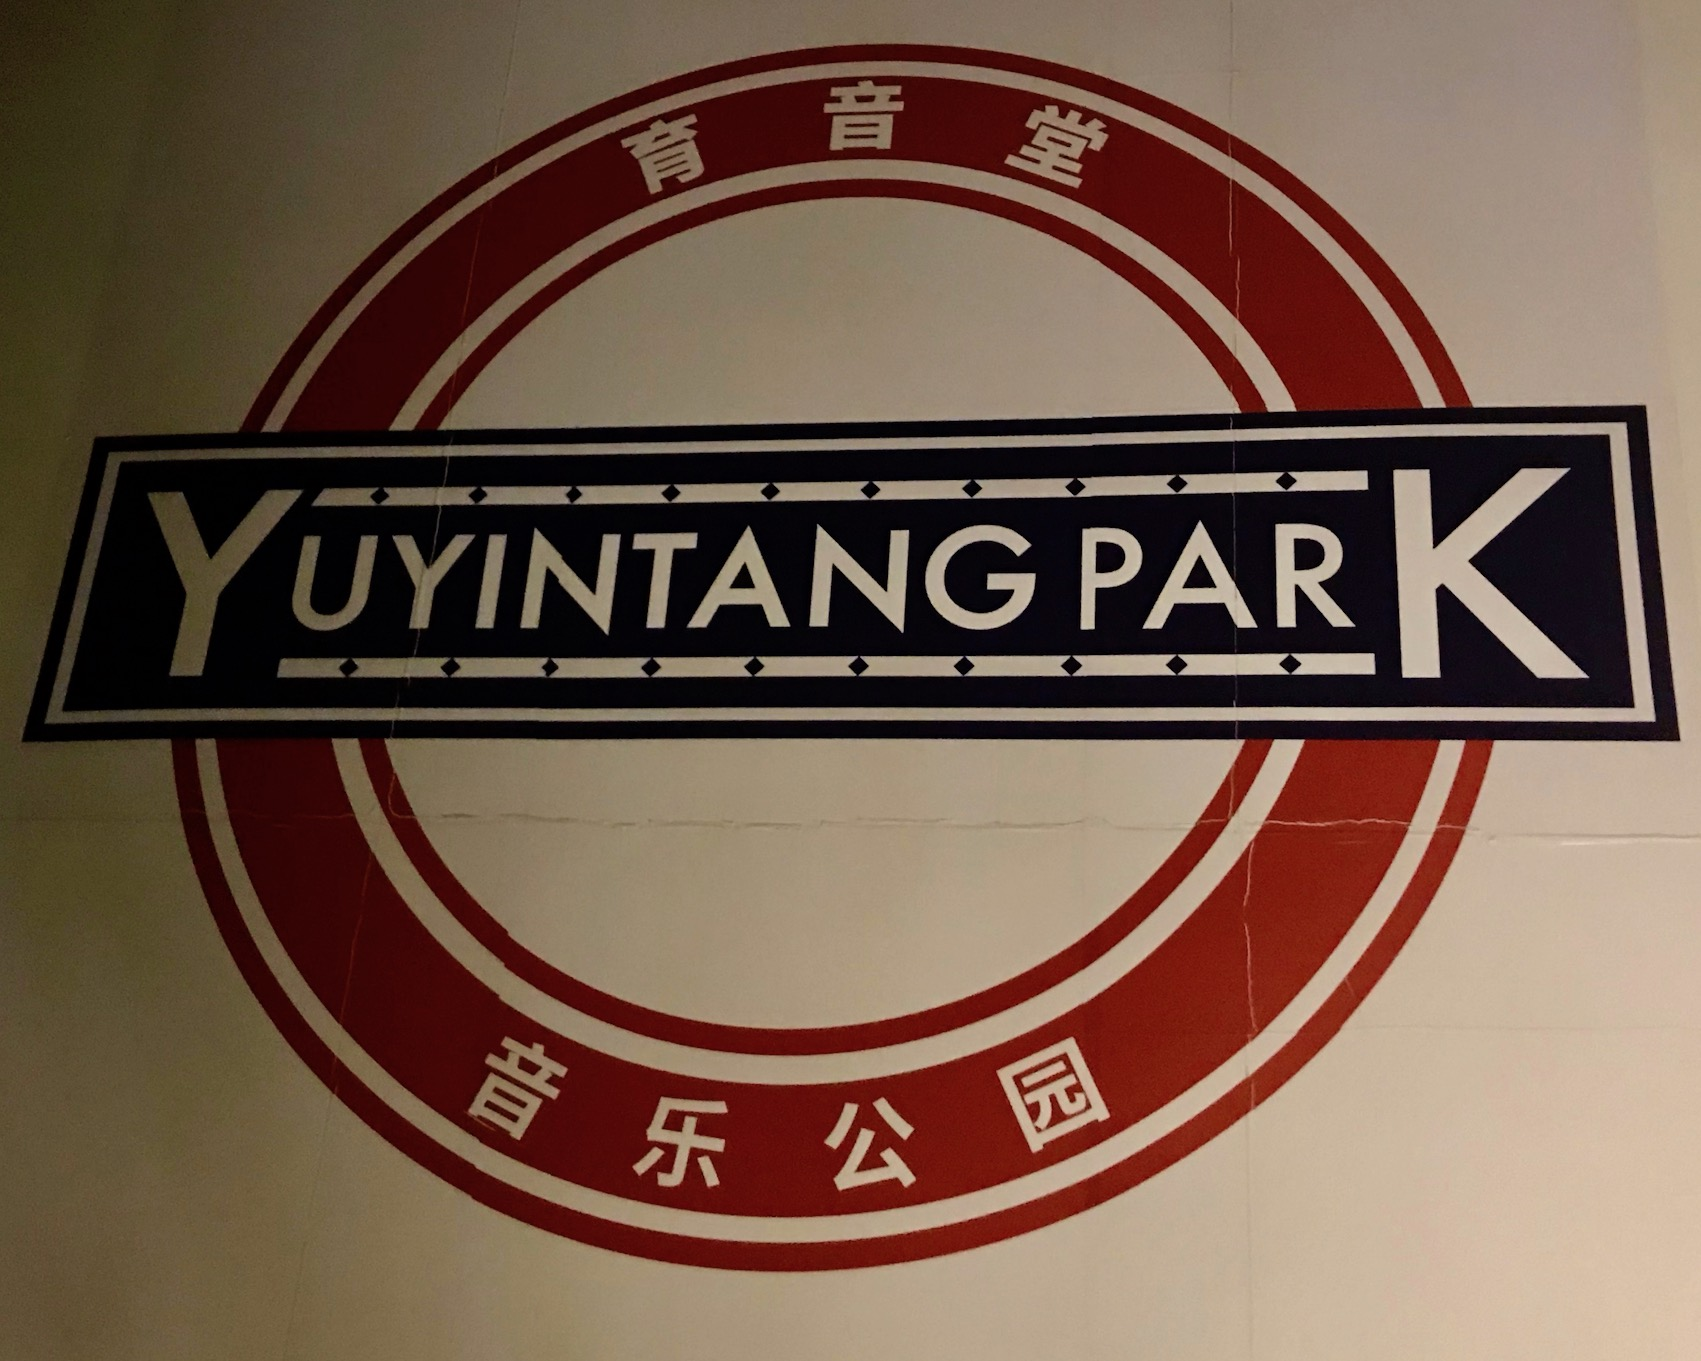 Yuyintang Park Live Music Venue Shanghai